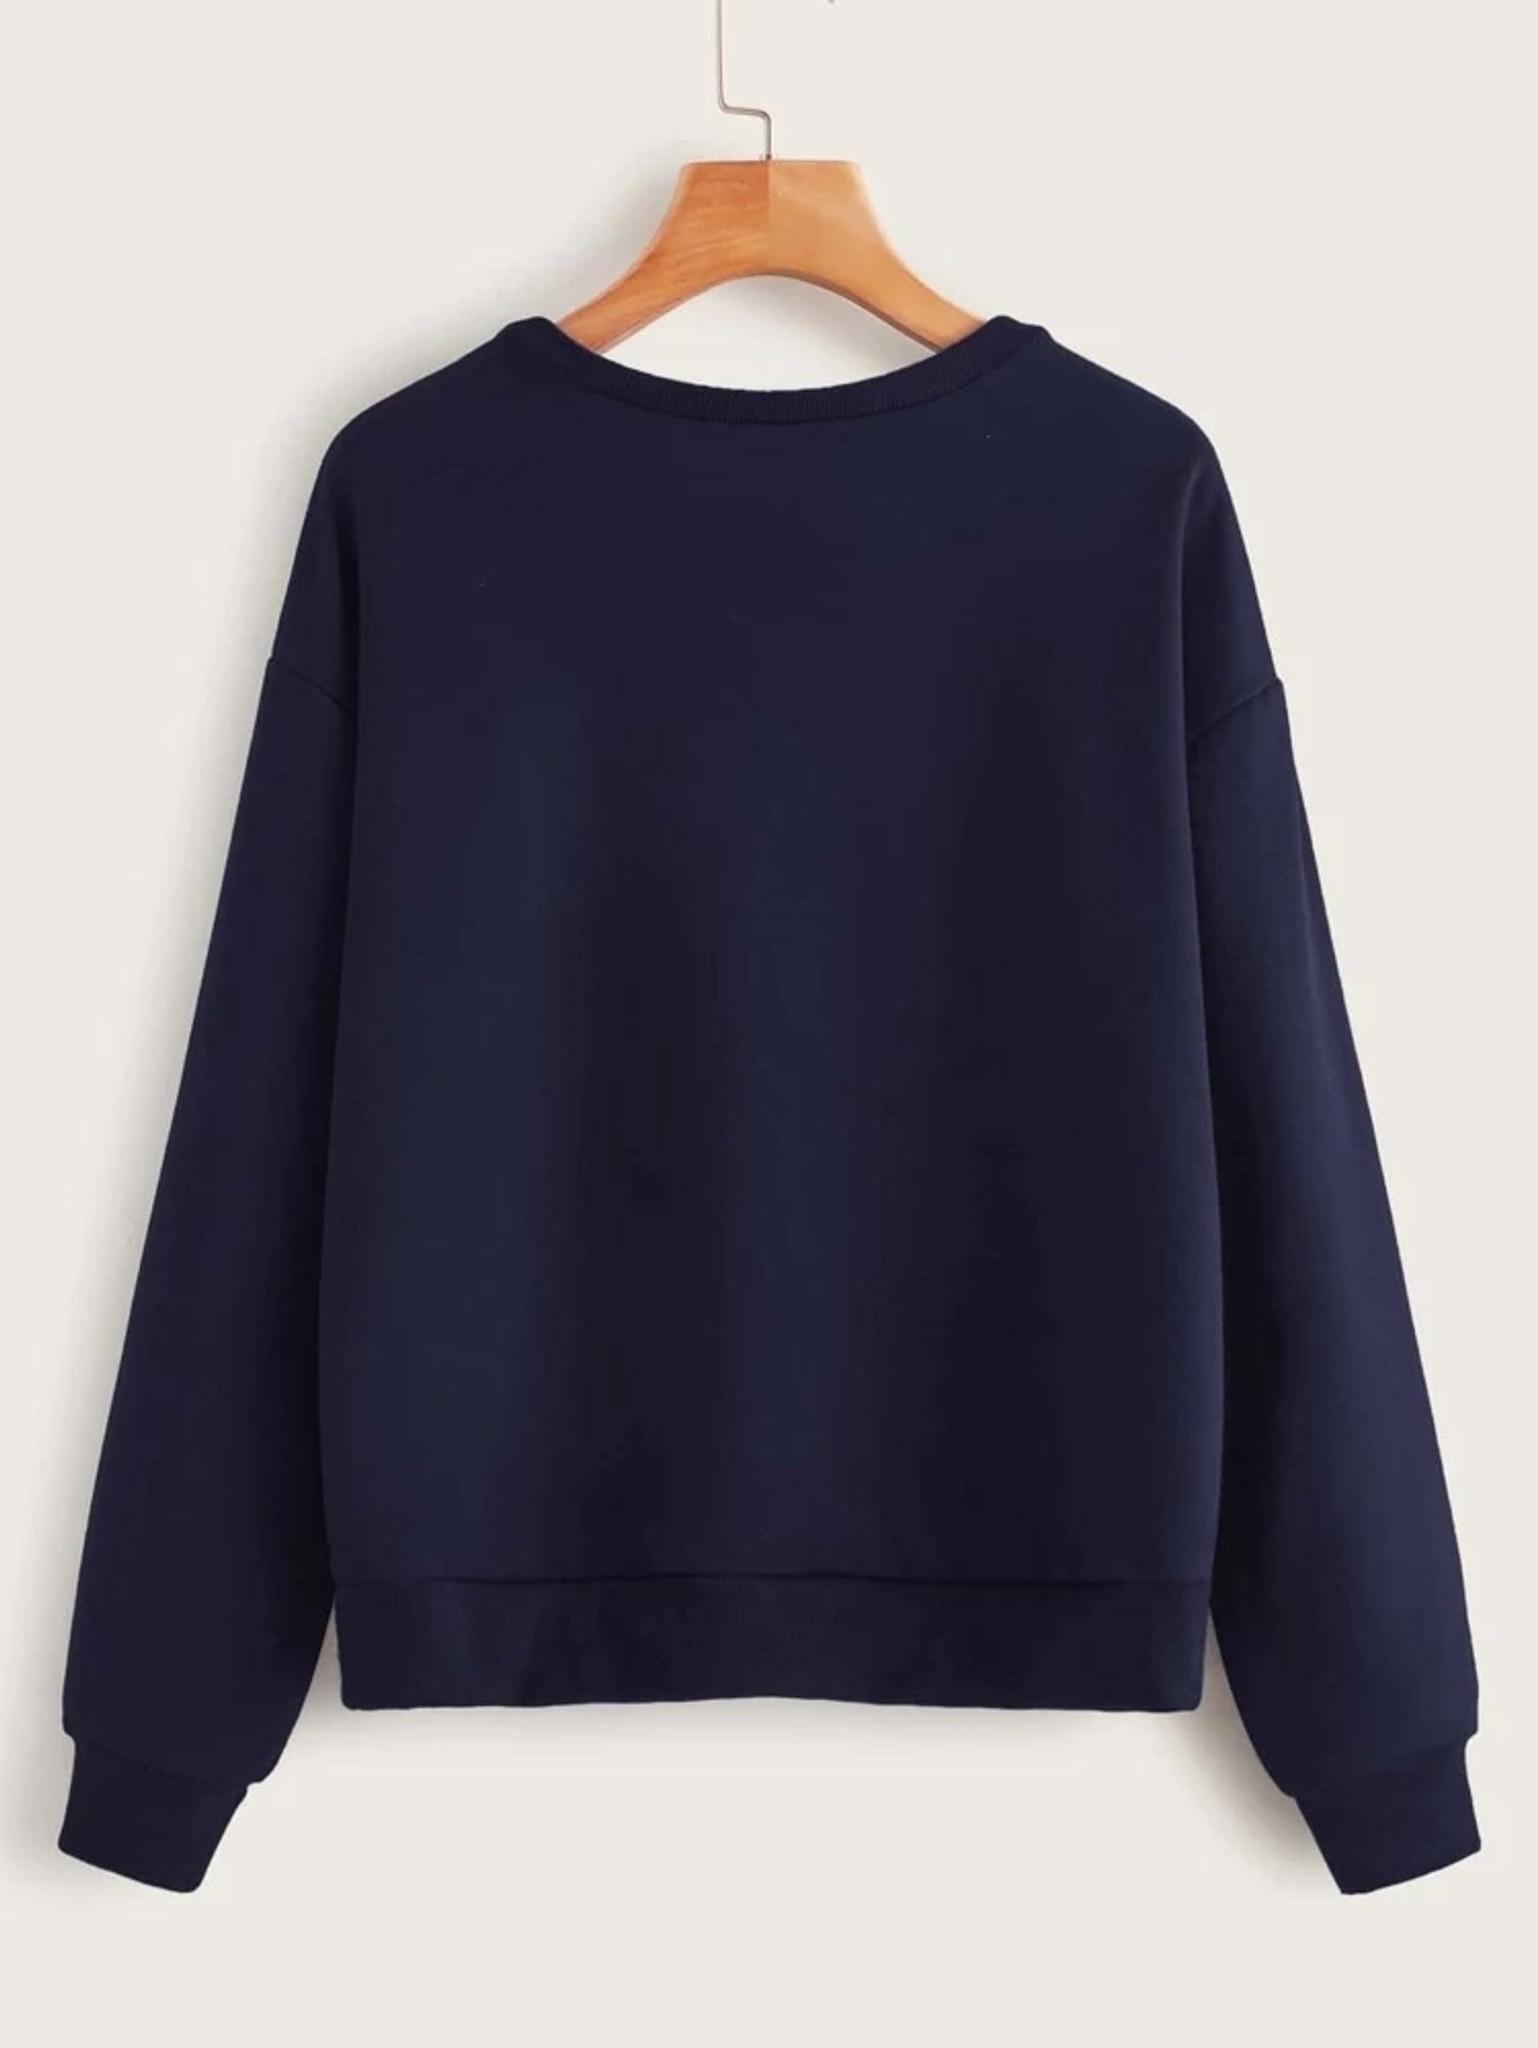 Fifth Avenue DIFT16 Wife Mom Boss Printed Sweatshirt - Navy Blue